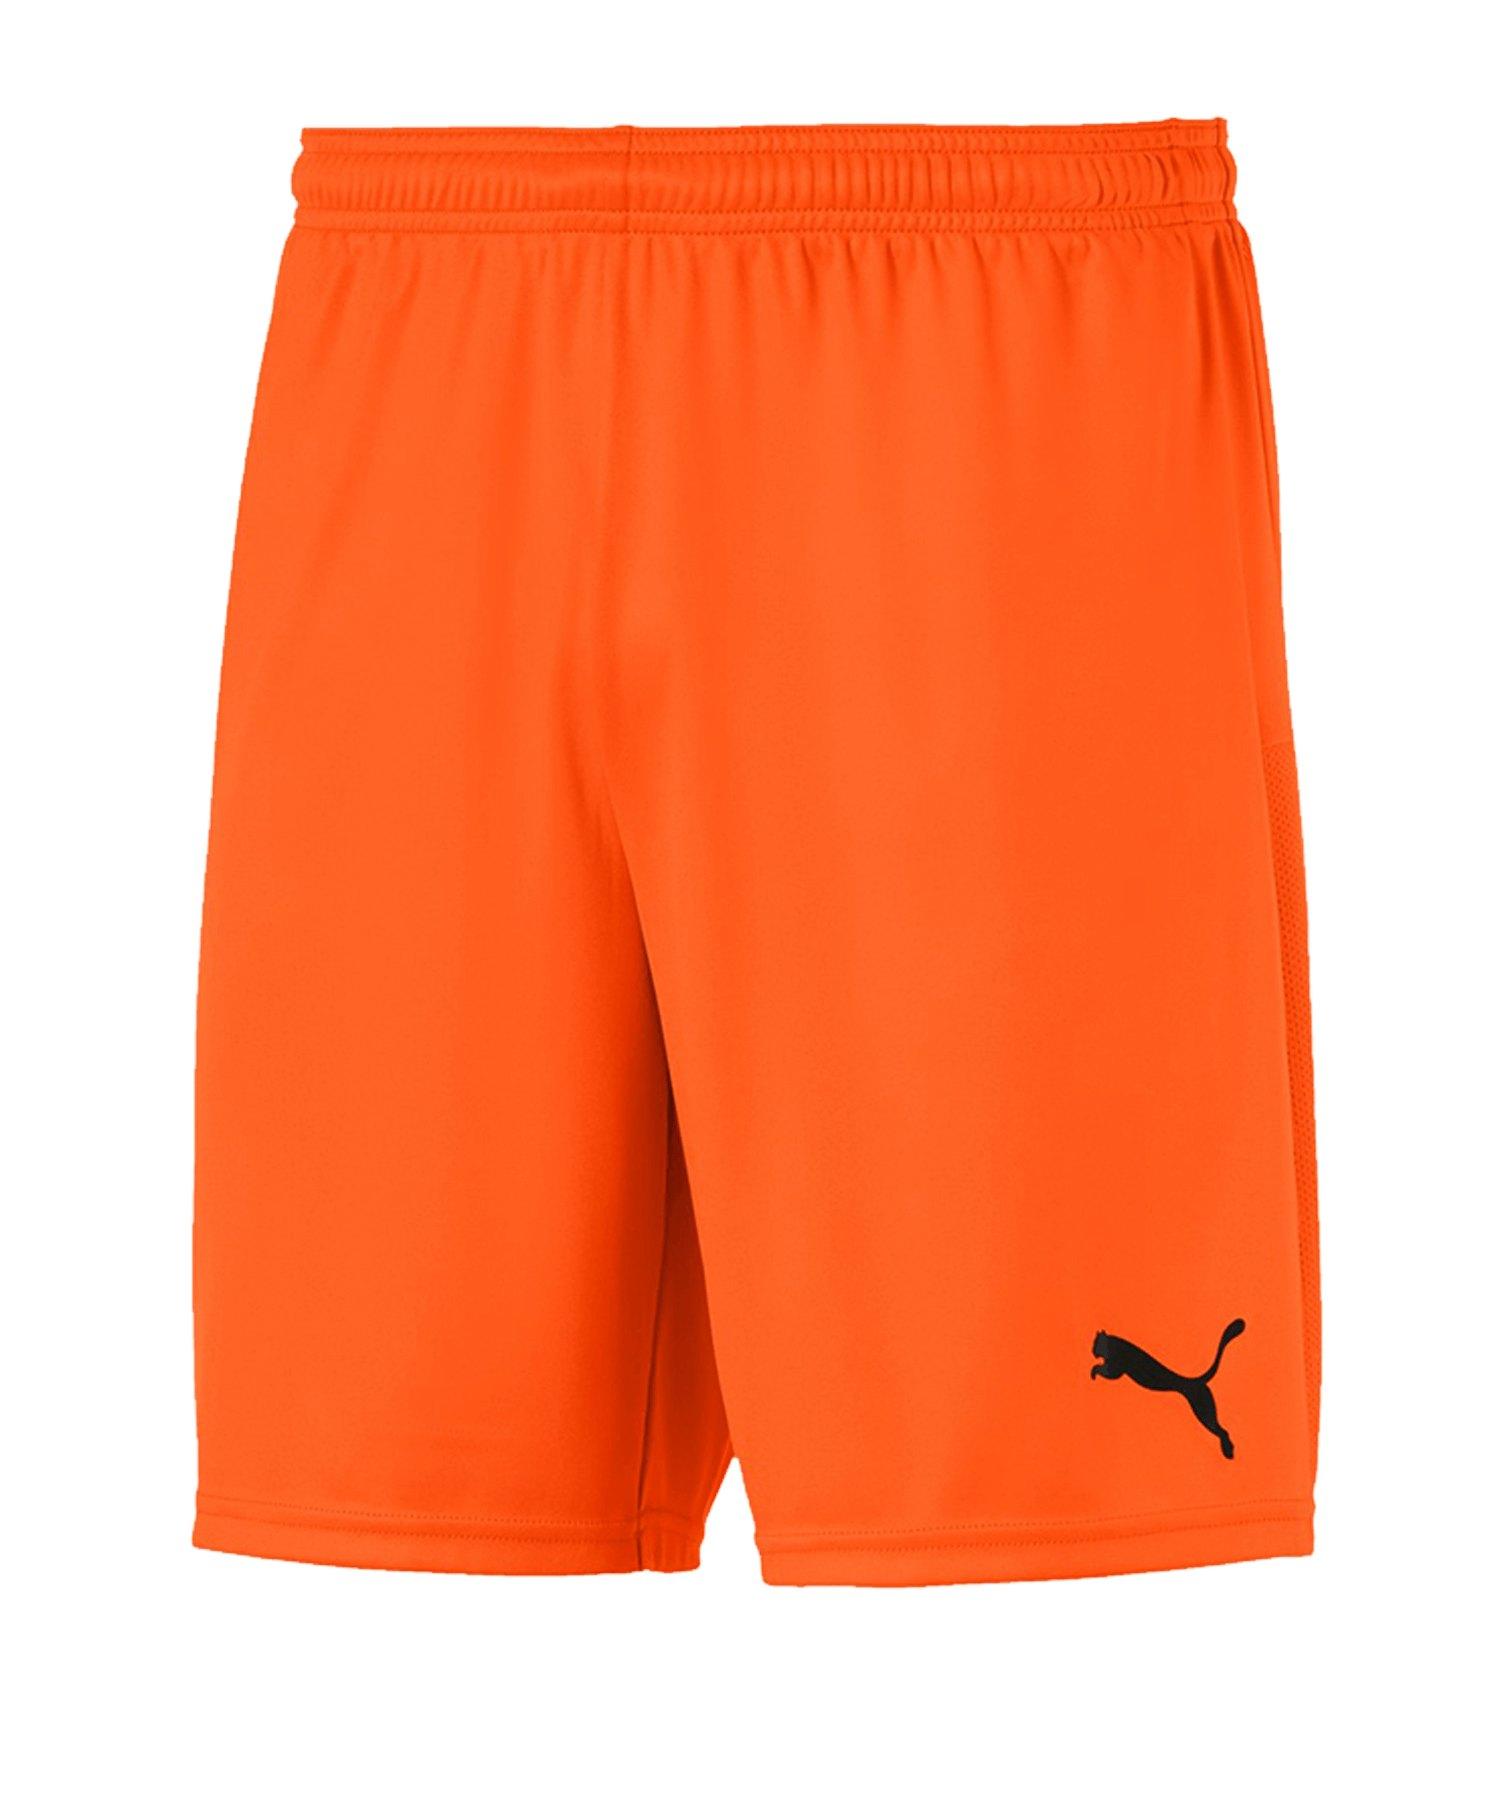 PUMA teamGOAL 23 Knit Short Orange F08 - orange